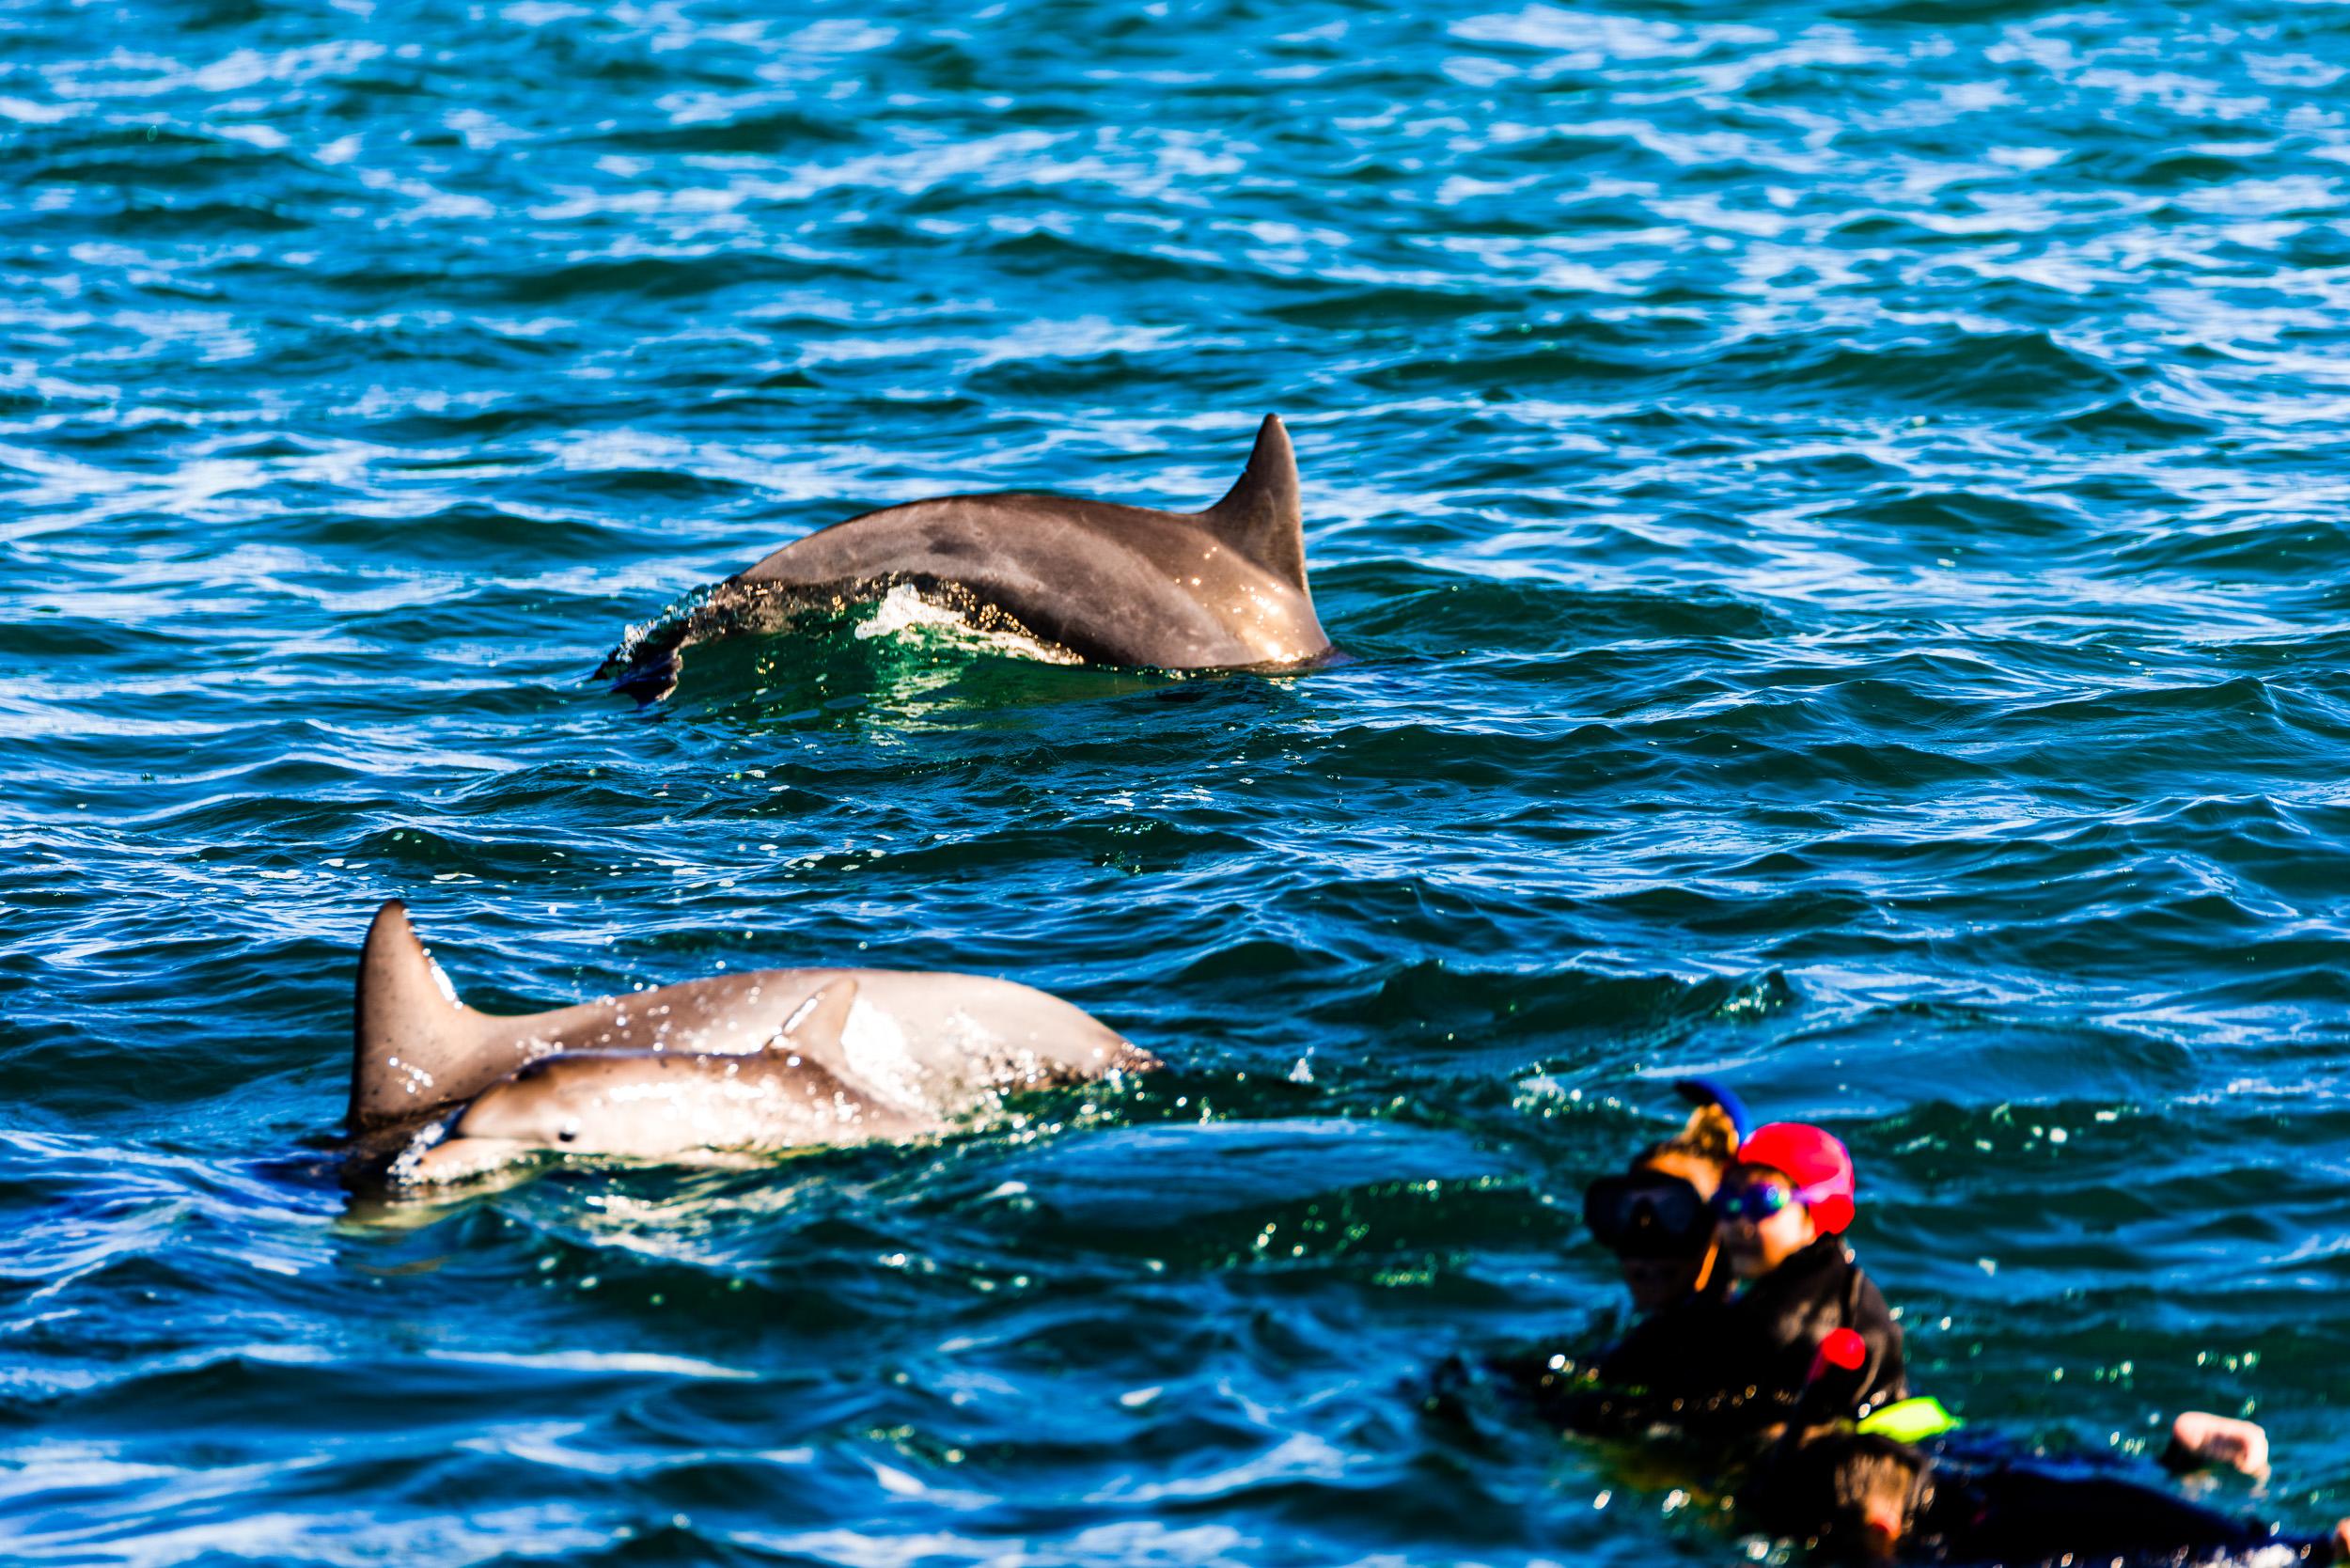 Spyrides_Kyle_Dolphin_Swimming_Rockingham_DSC2692.jpg